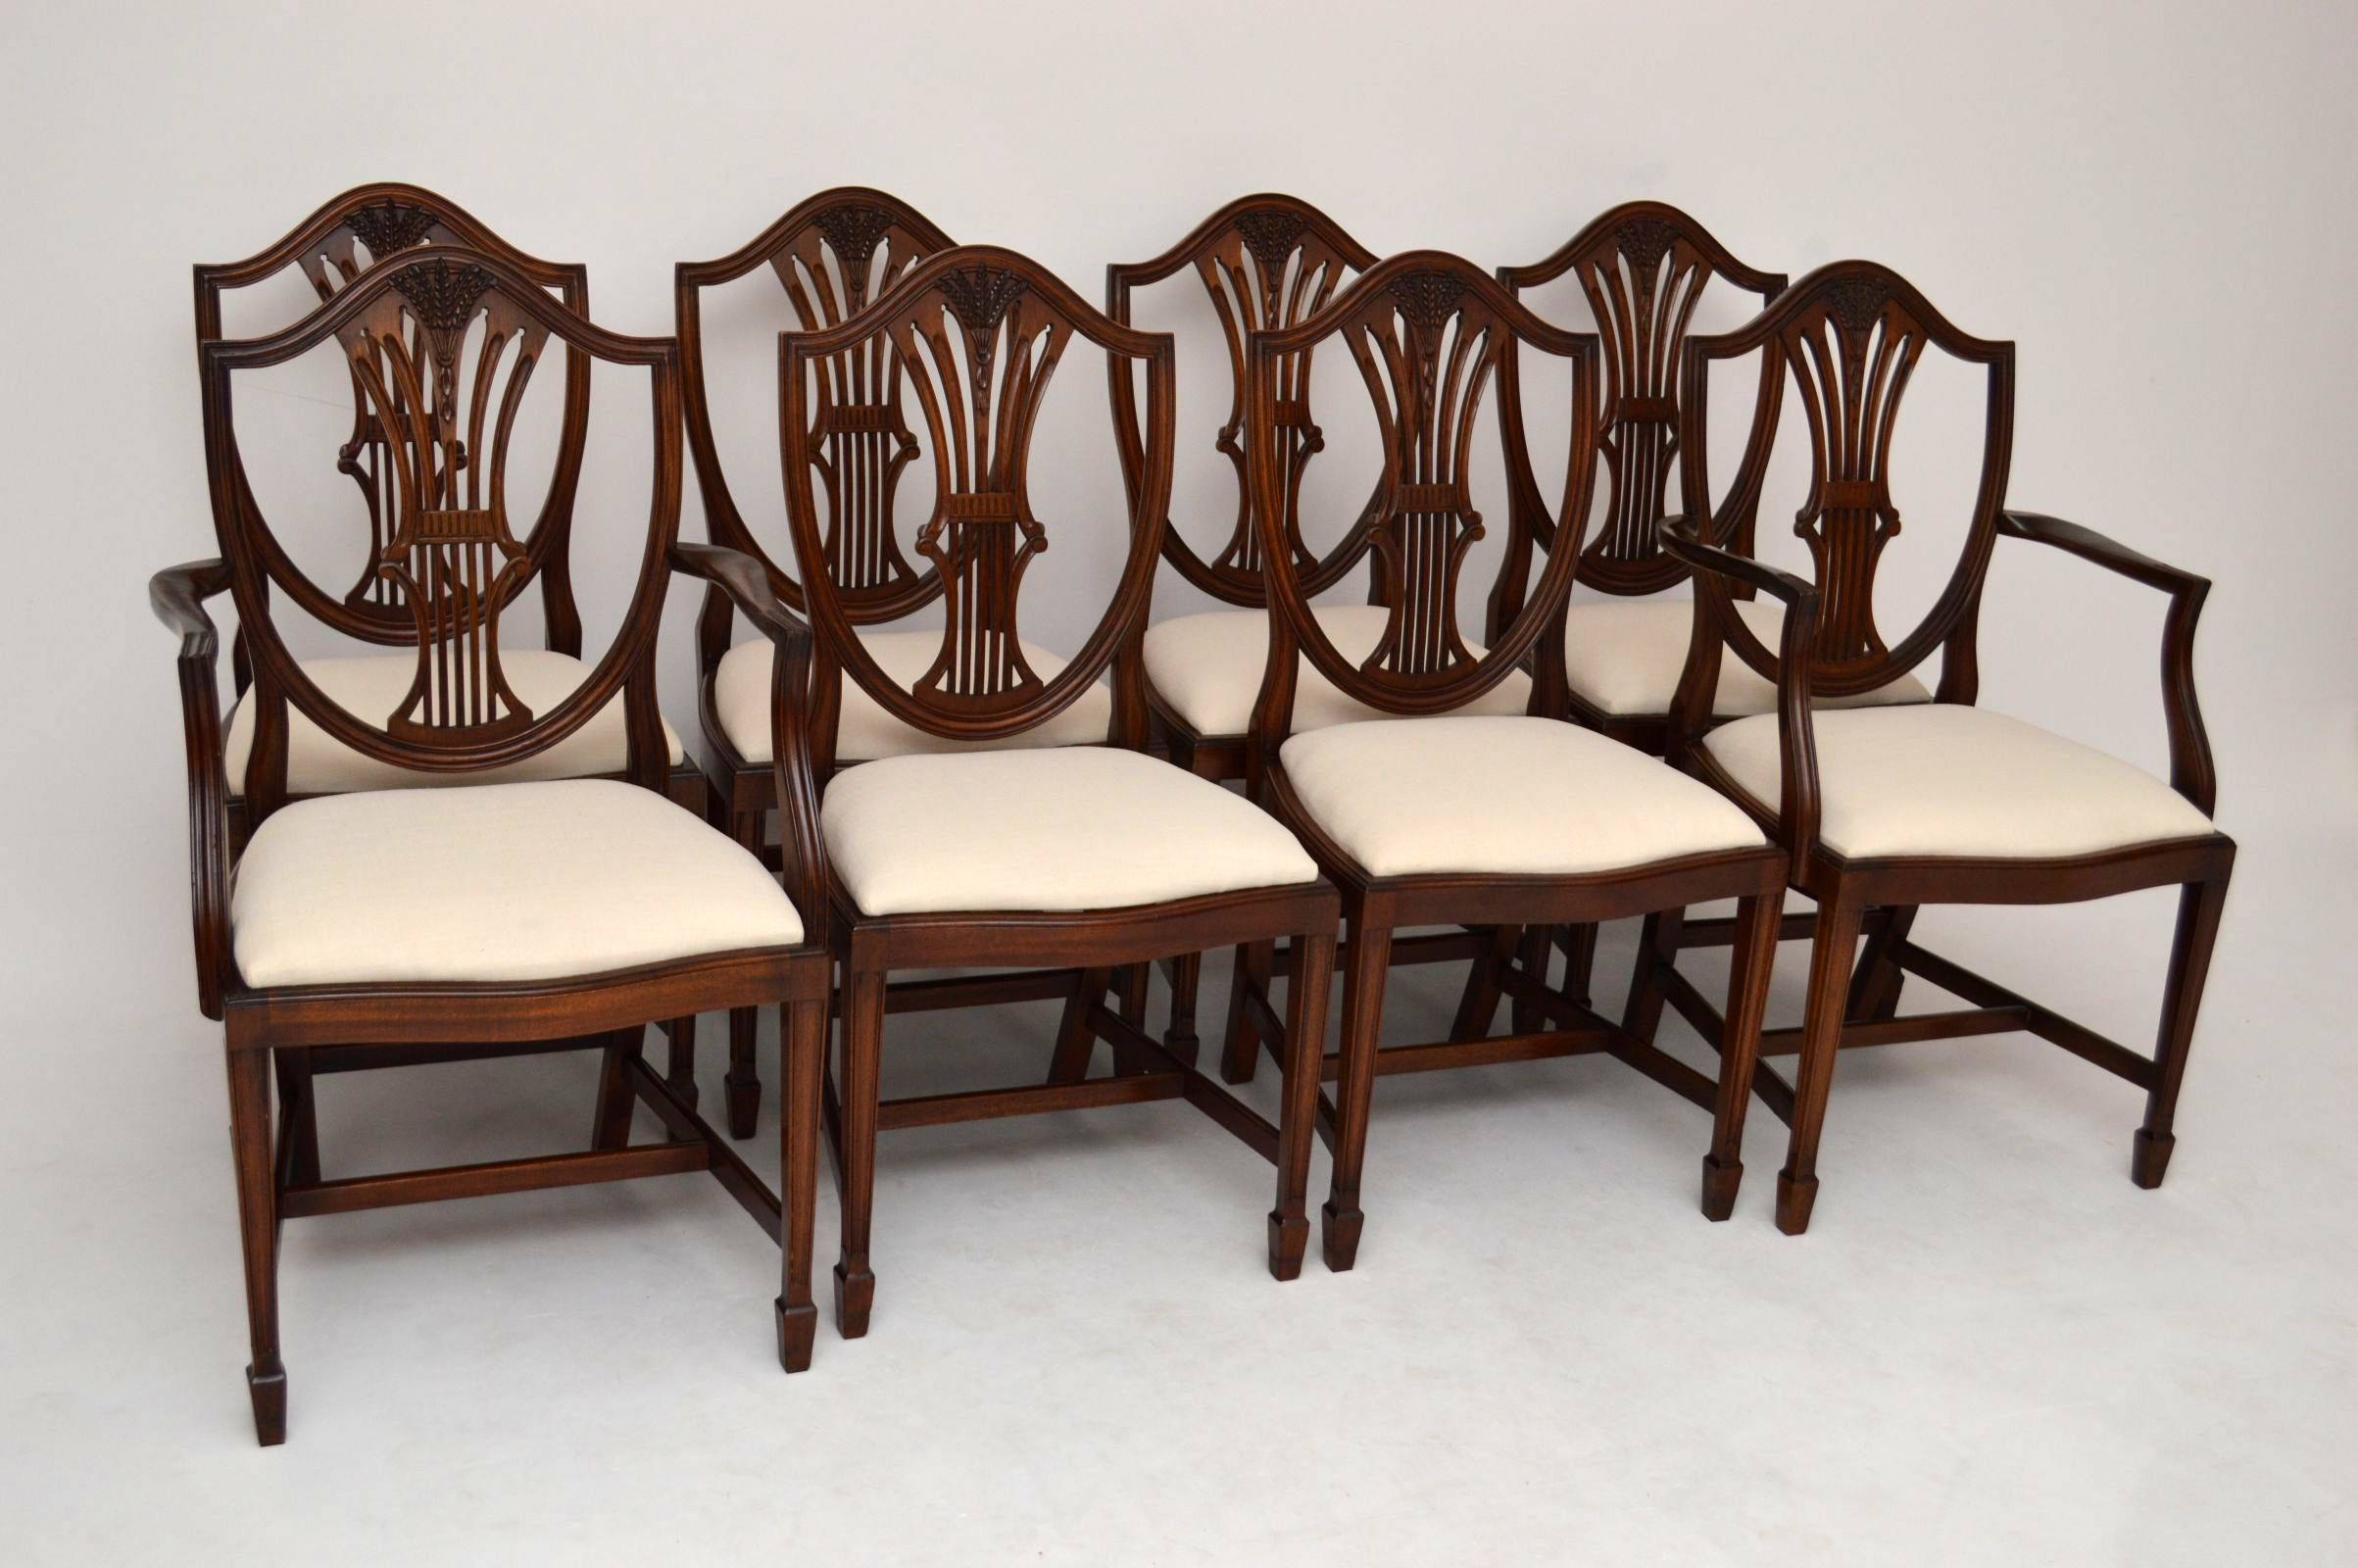 Eßzimmerstühle 8er satz antike georgian stühle eßzimmerstühle